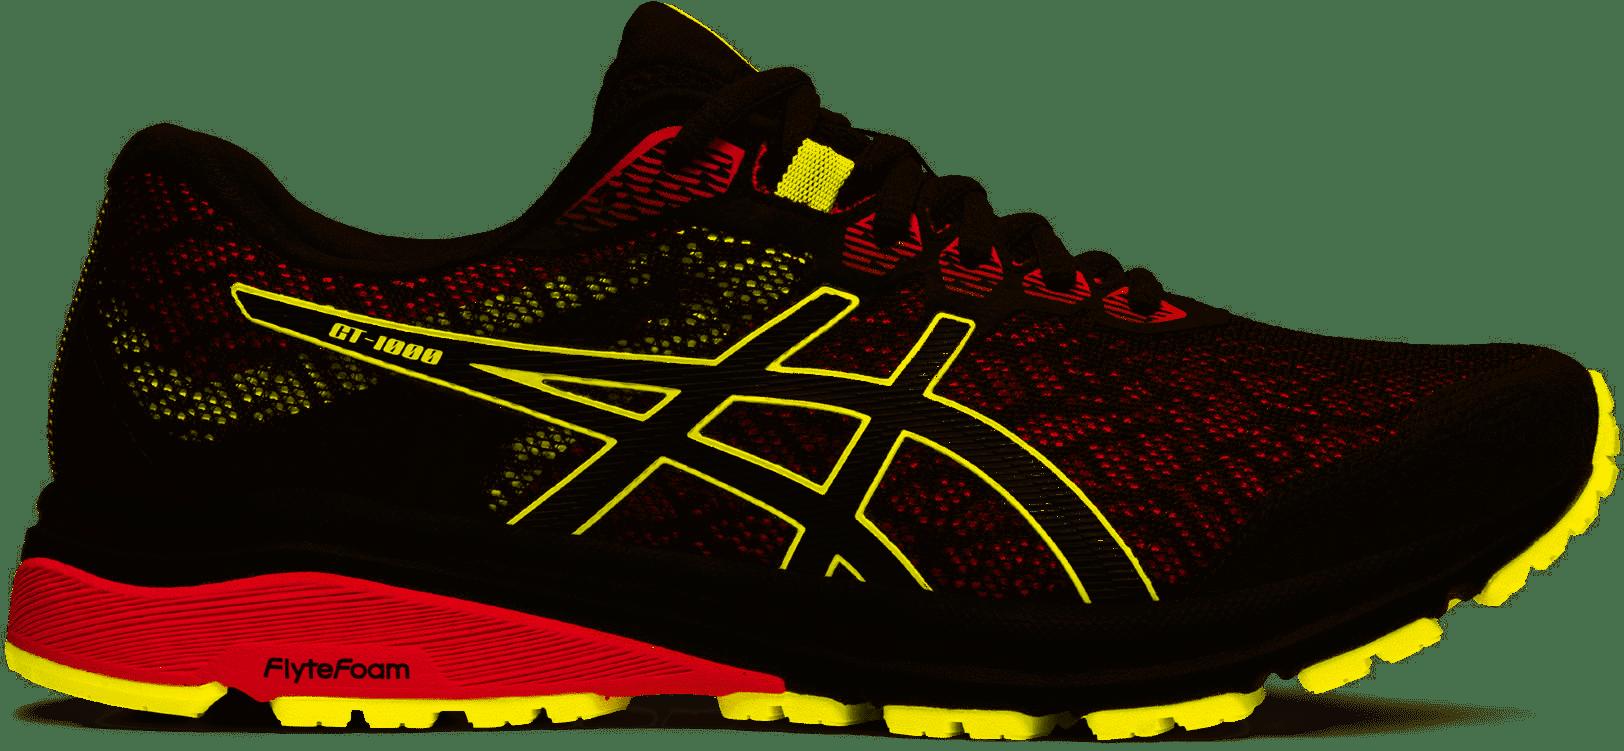 Asics GT 1000 8 GTX Mens Running Shoe, Graphite Grey/ Sour Yuzu